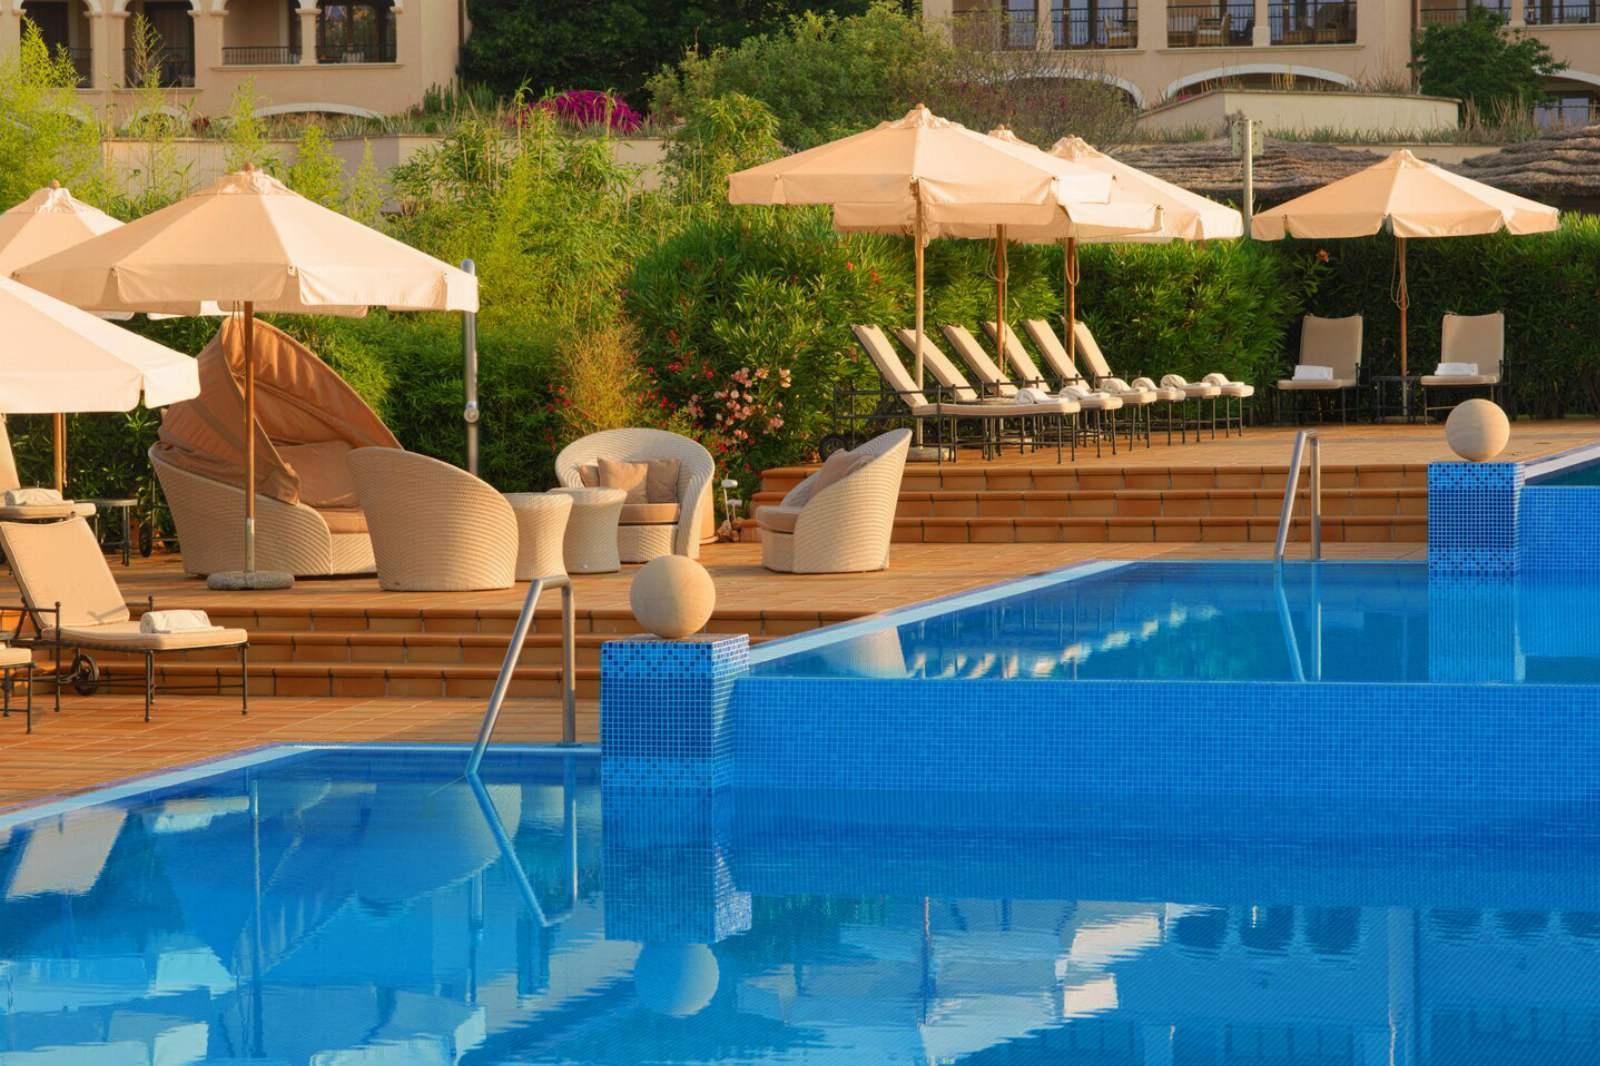 St. Regis Mardavall Resort - Swimming Pool